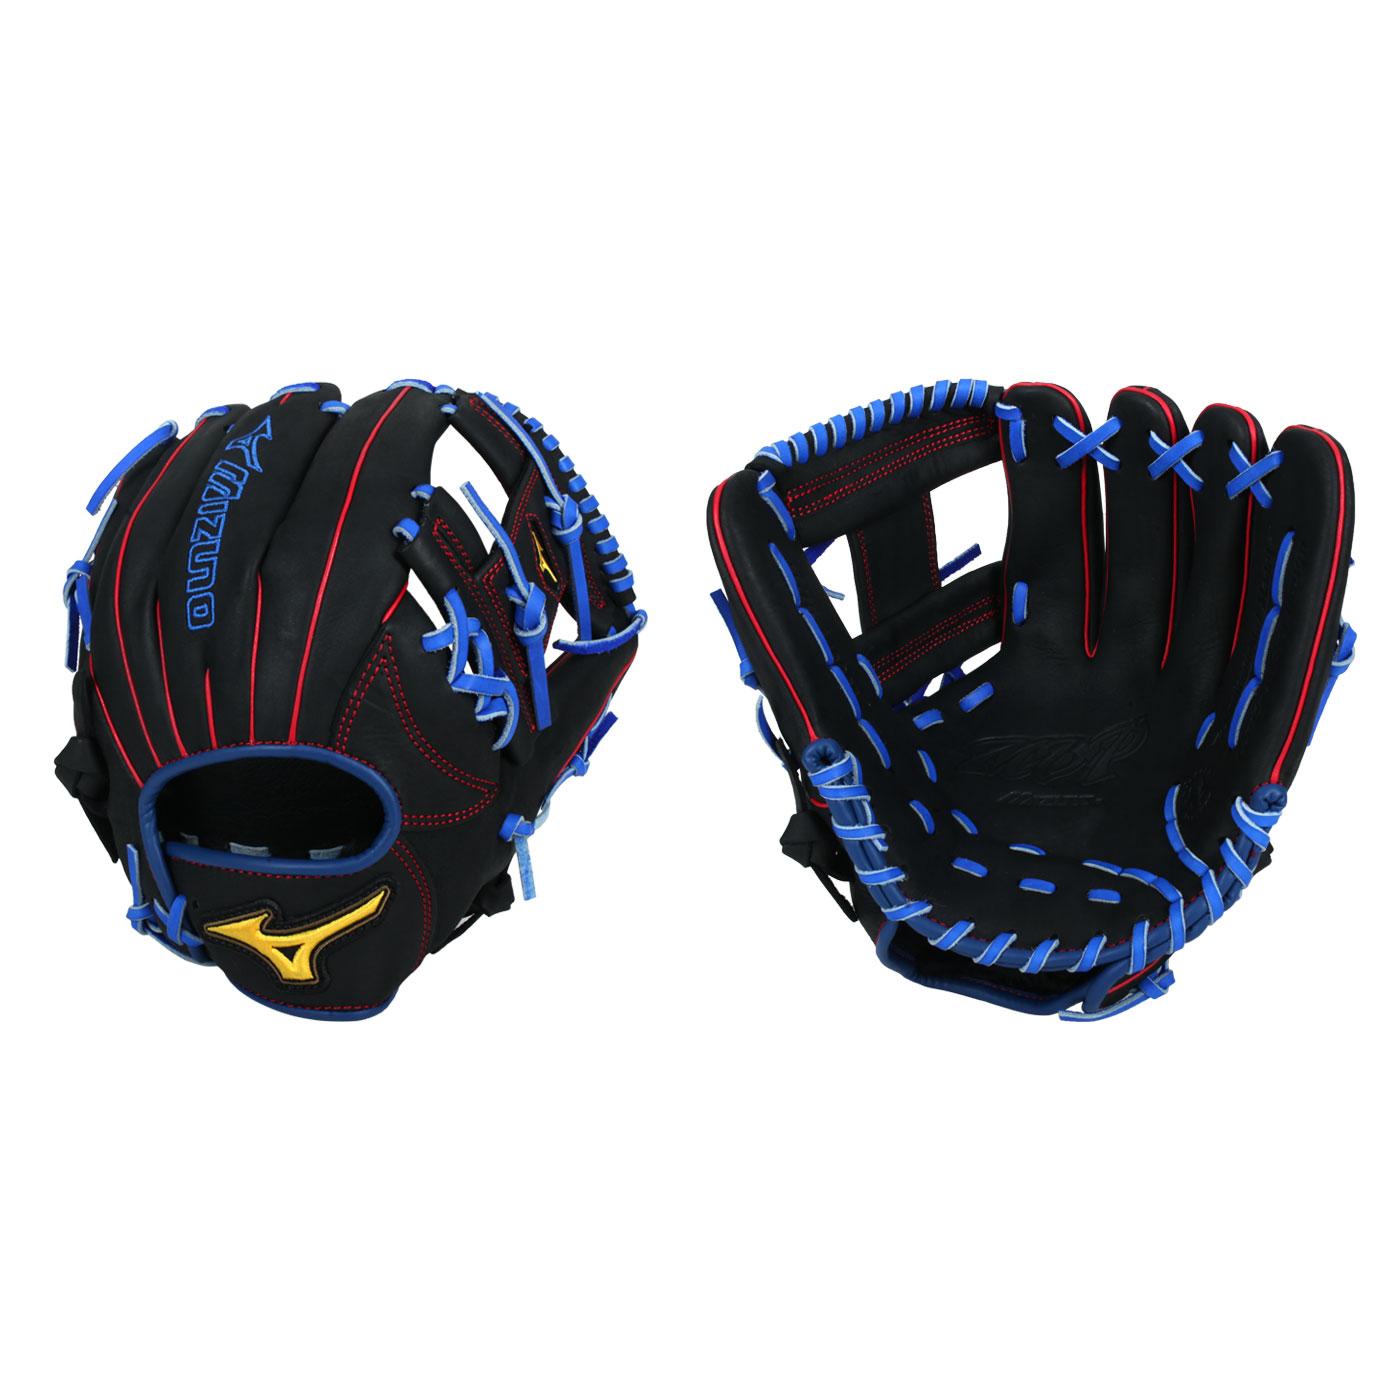 MIZUNO 壘球手套 1ATGS21800-09